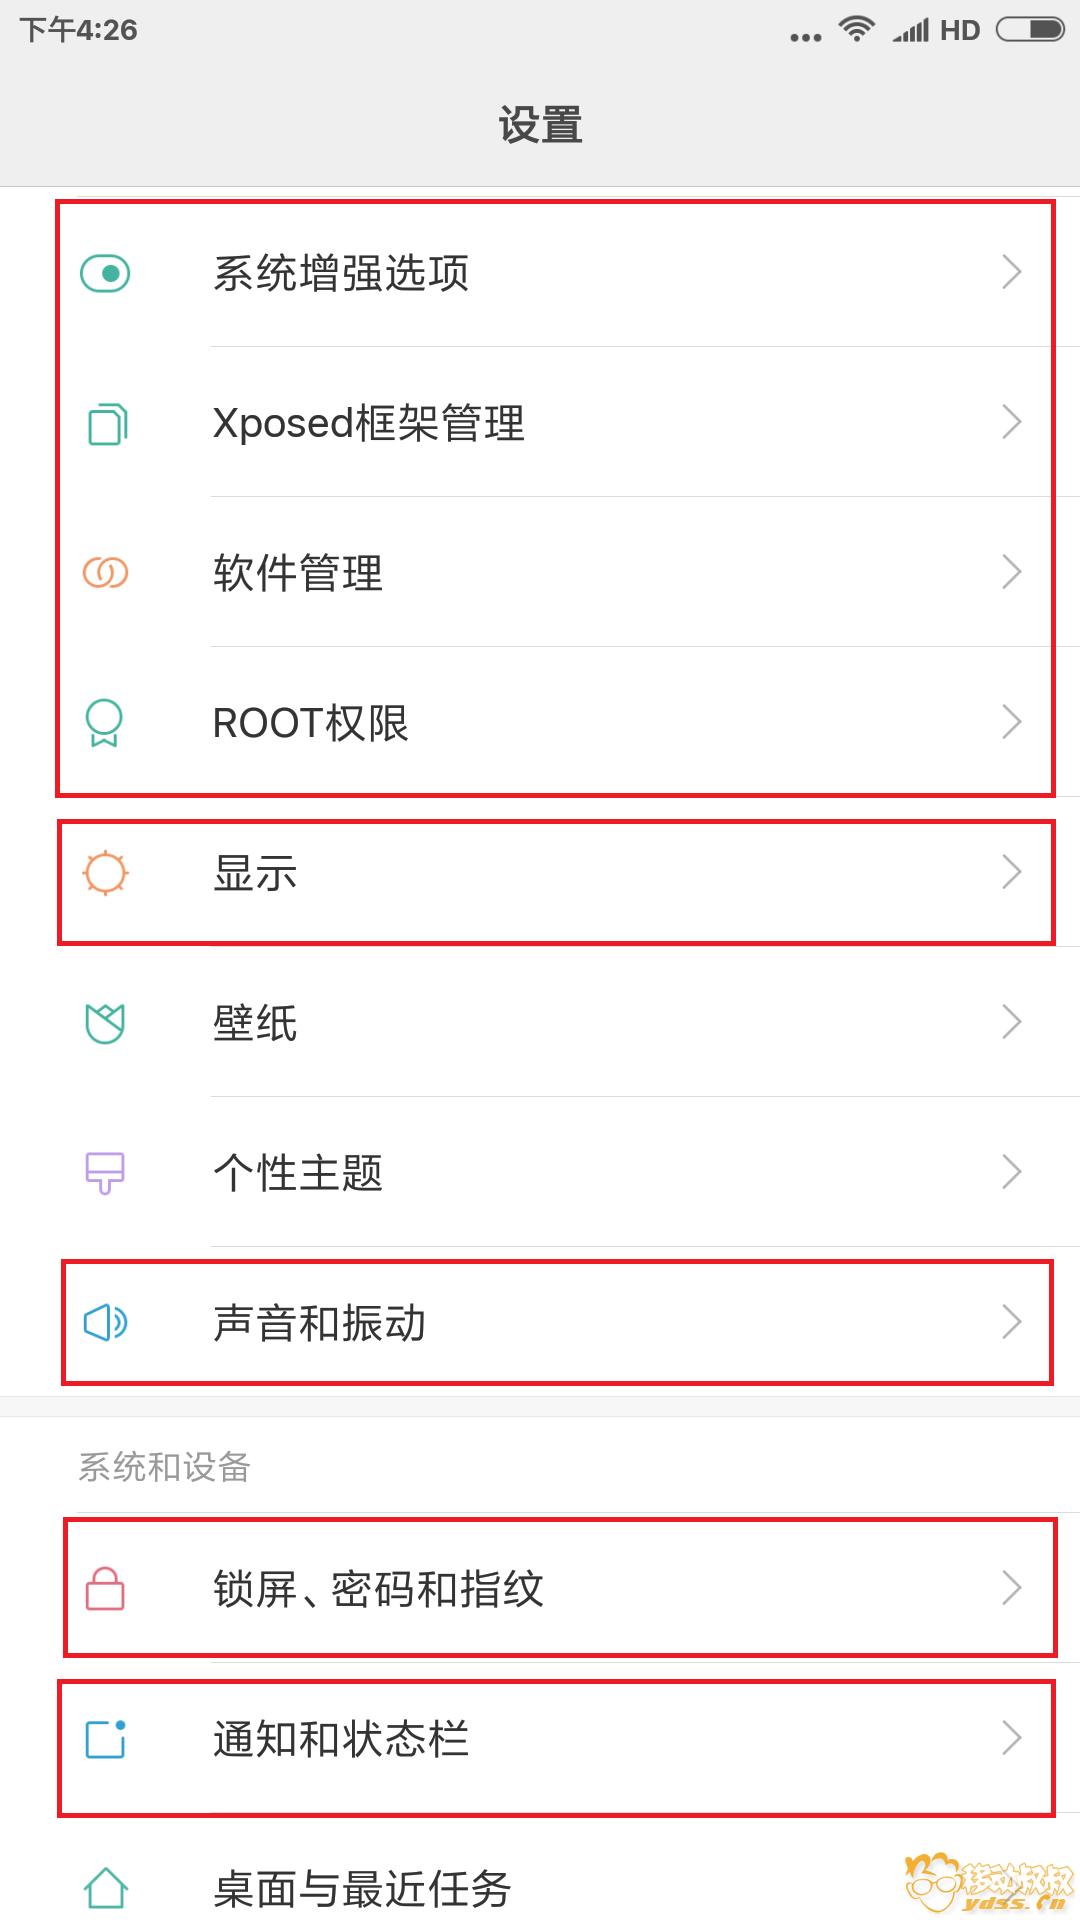 Screenshot_2018-05-19-16-26-38-892_com.android.settings.png